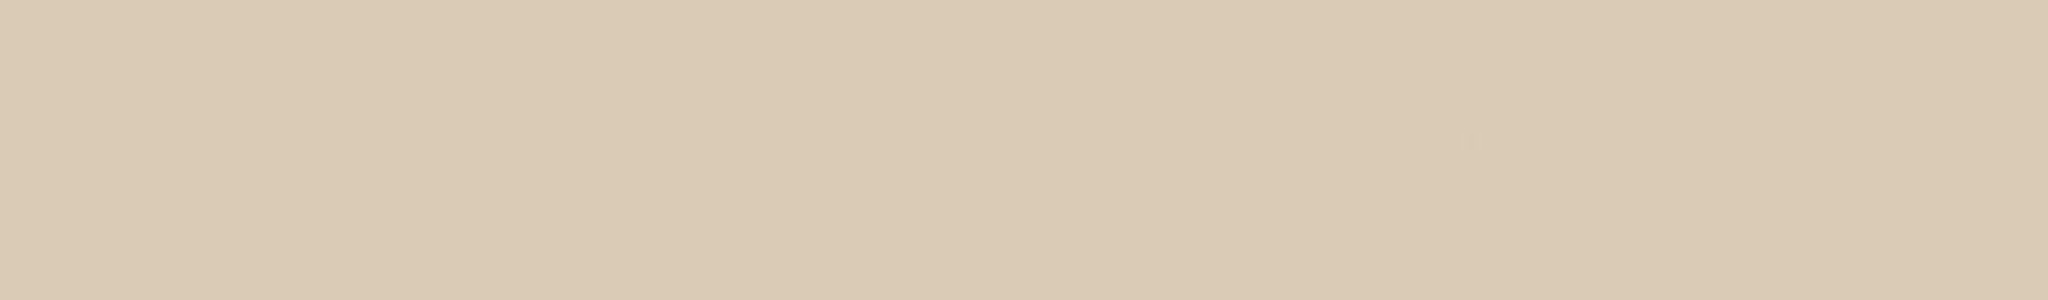 HU 12499 canto ABS beige liso mate